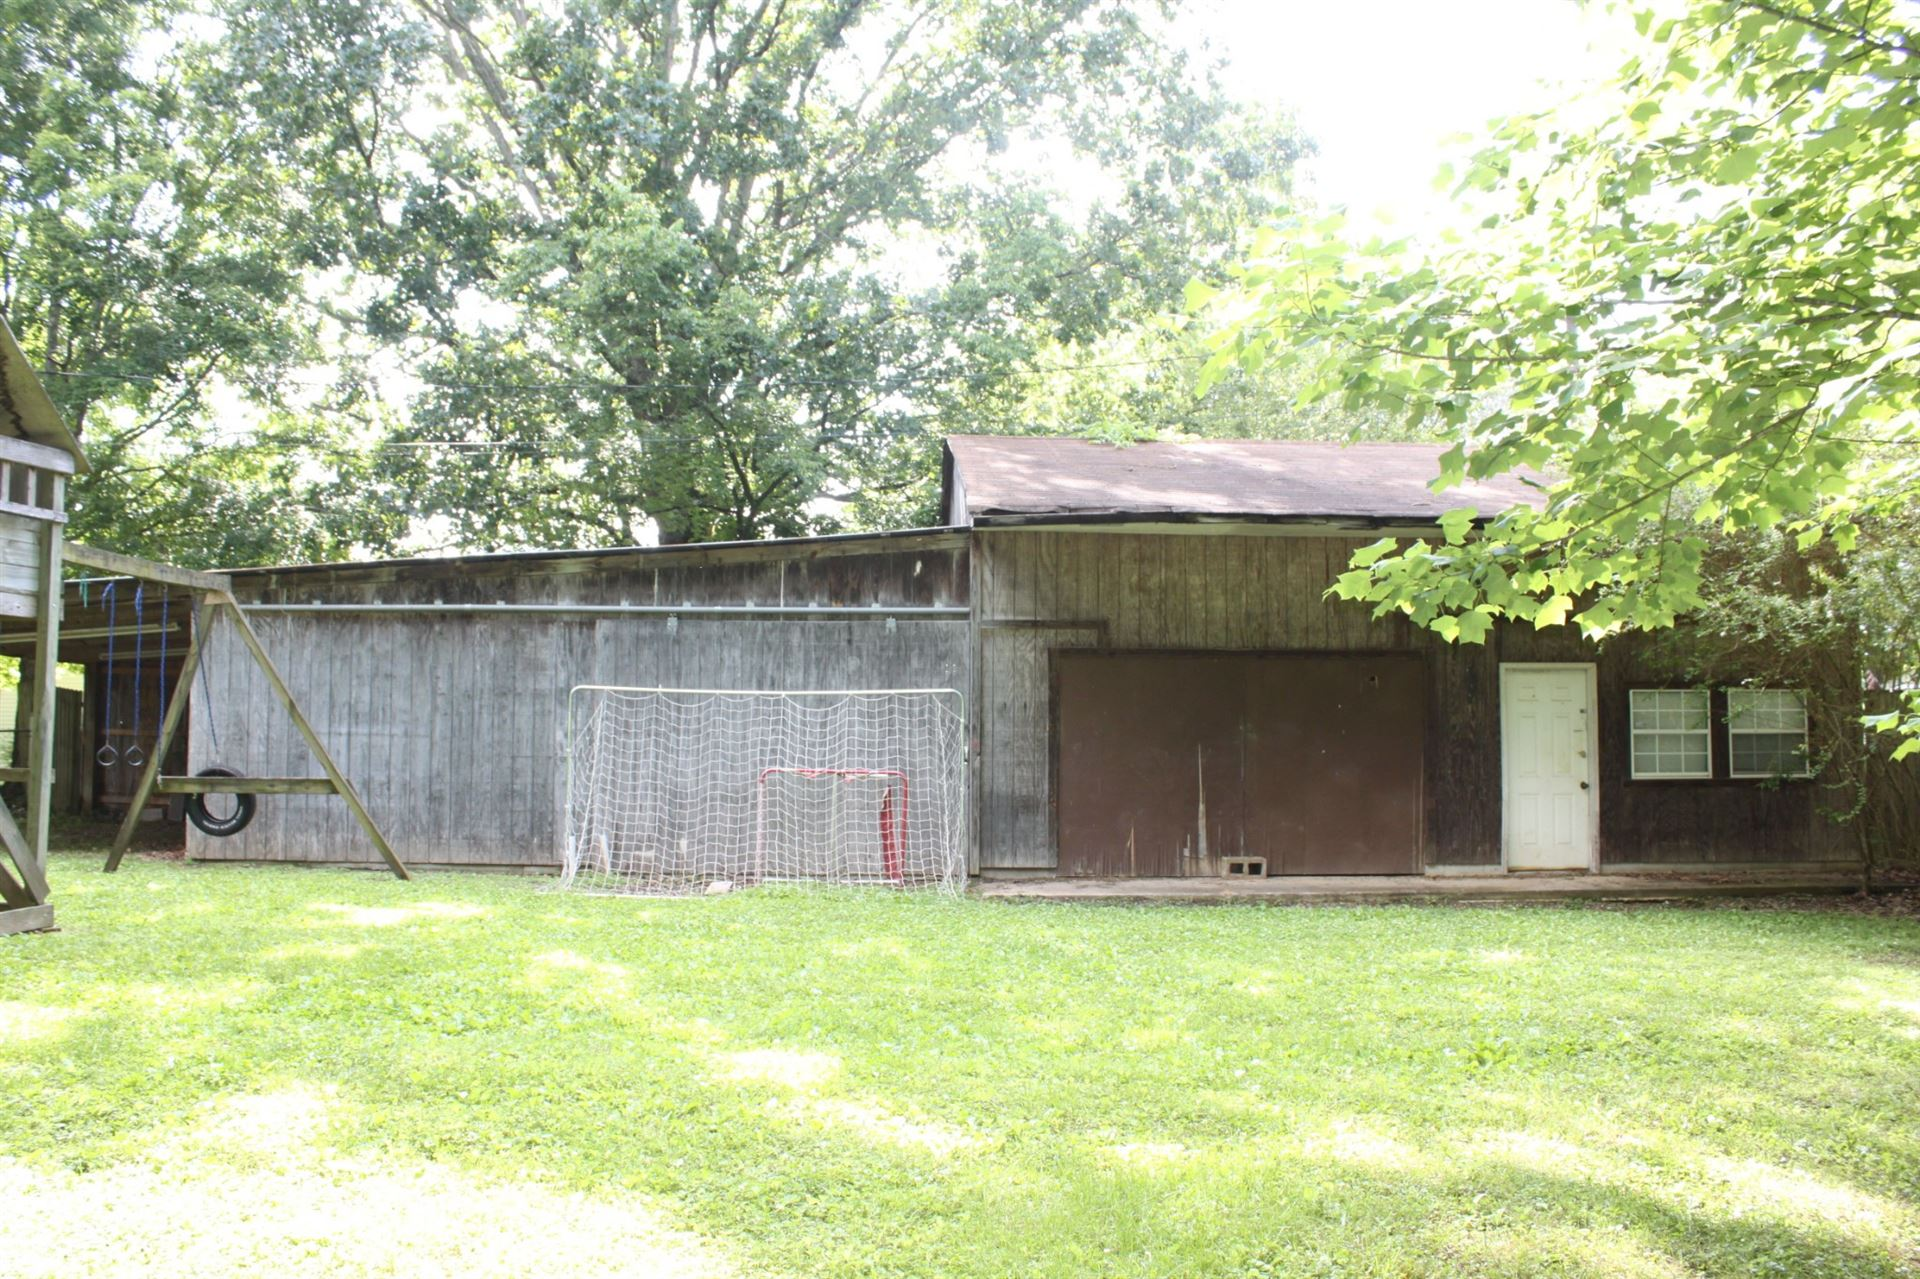 Photo of 1205 Johnson St, Burns, TN 37029 (MLS # 2262273)